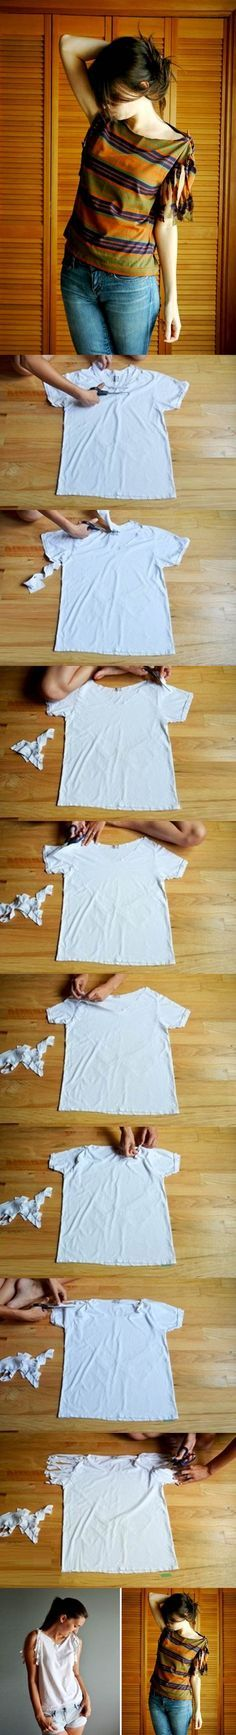 DIY No-Sew Refashion a Basic Tee   iCreativeIdeas.com Like Us on Facebook ==> https://www.facebook.com/icreativeideas